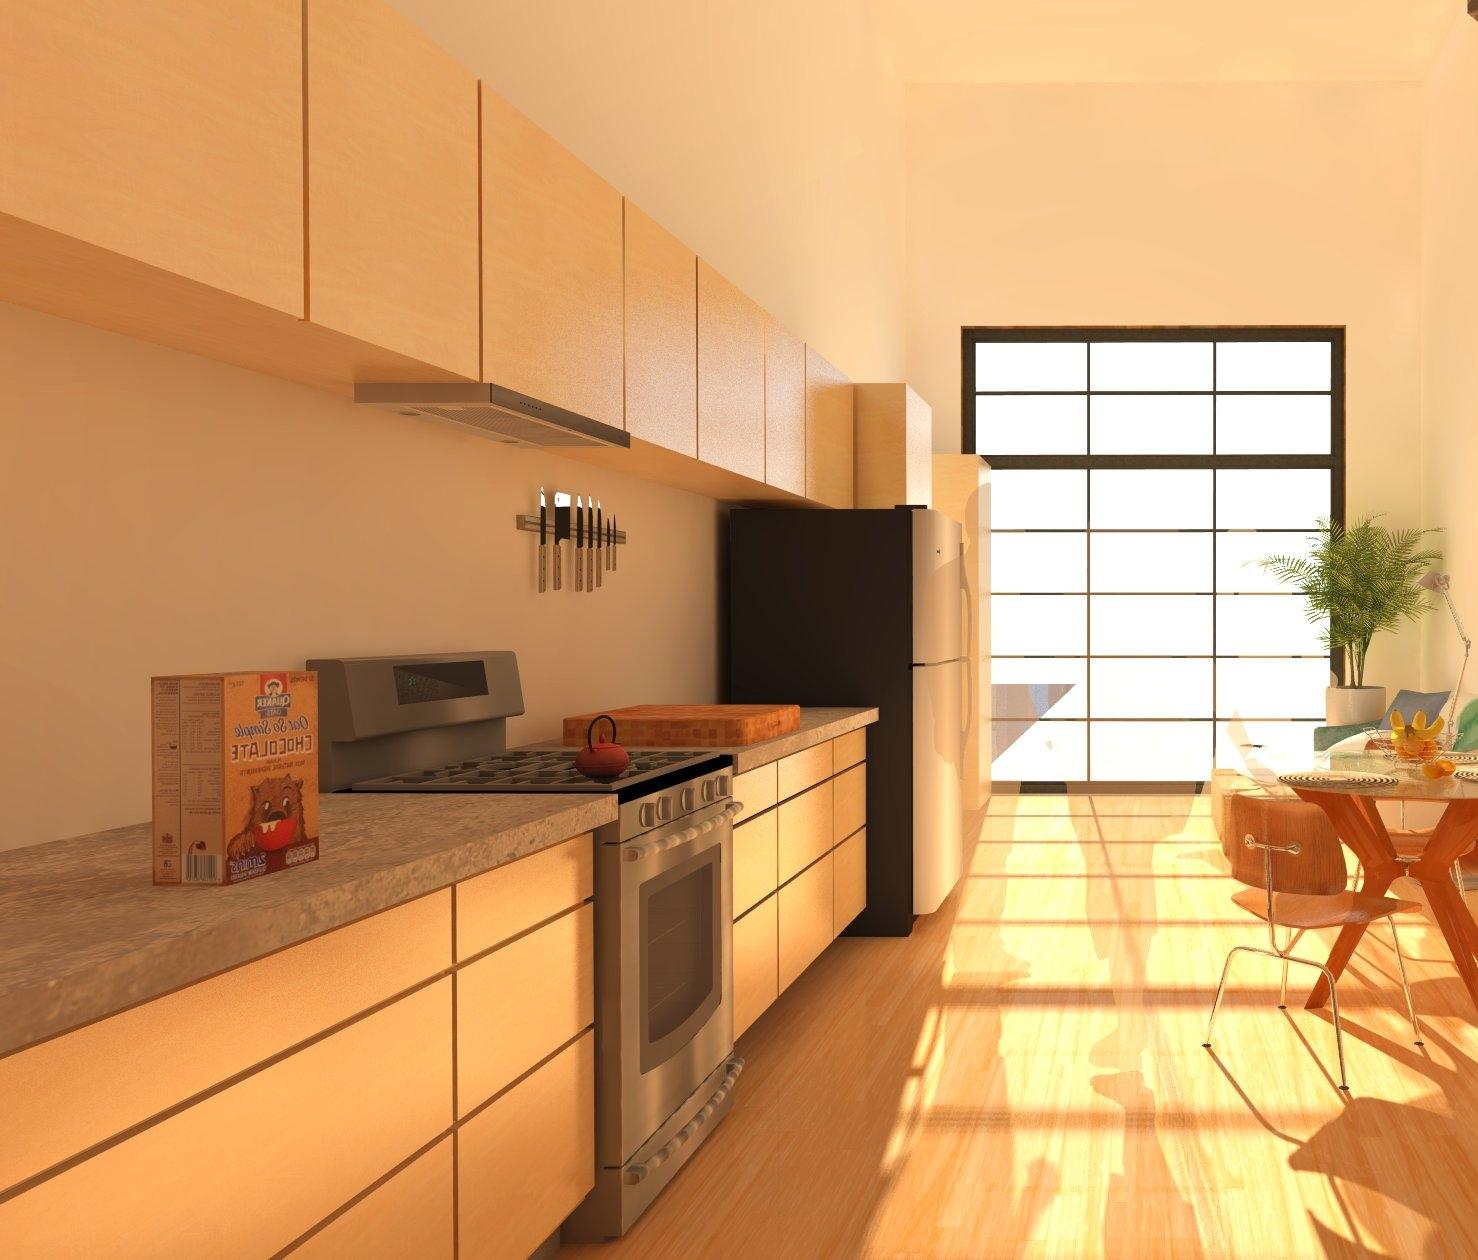 micro interior 2.jpg